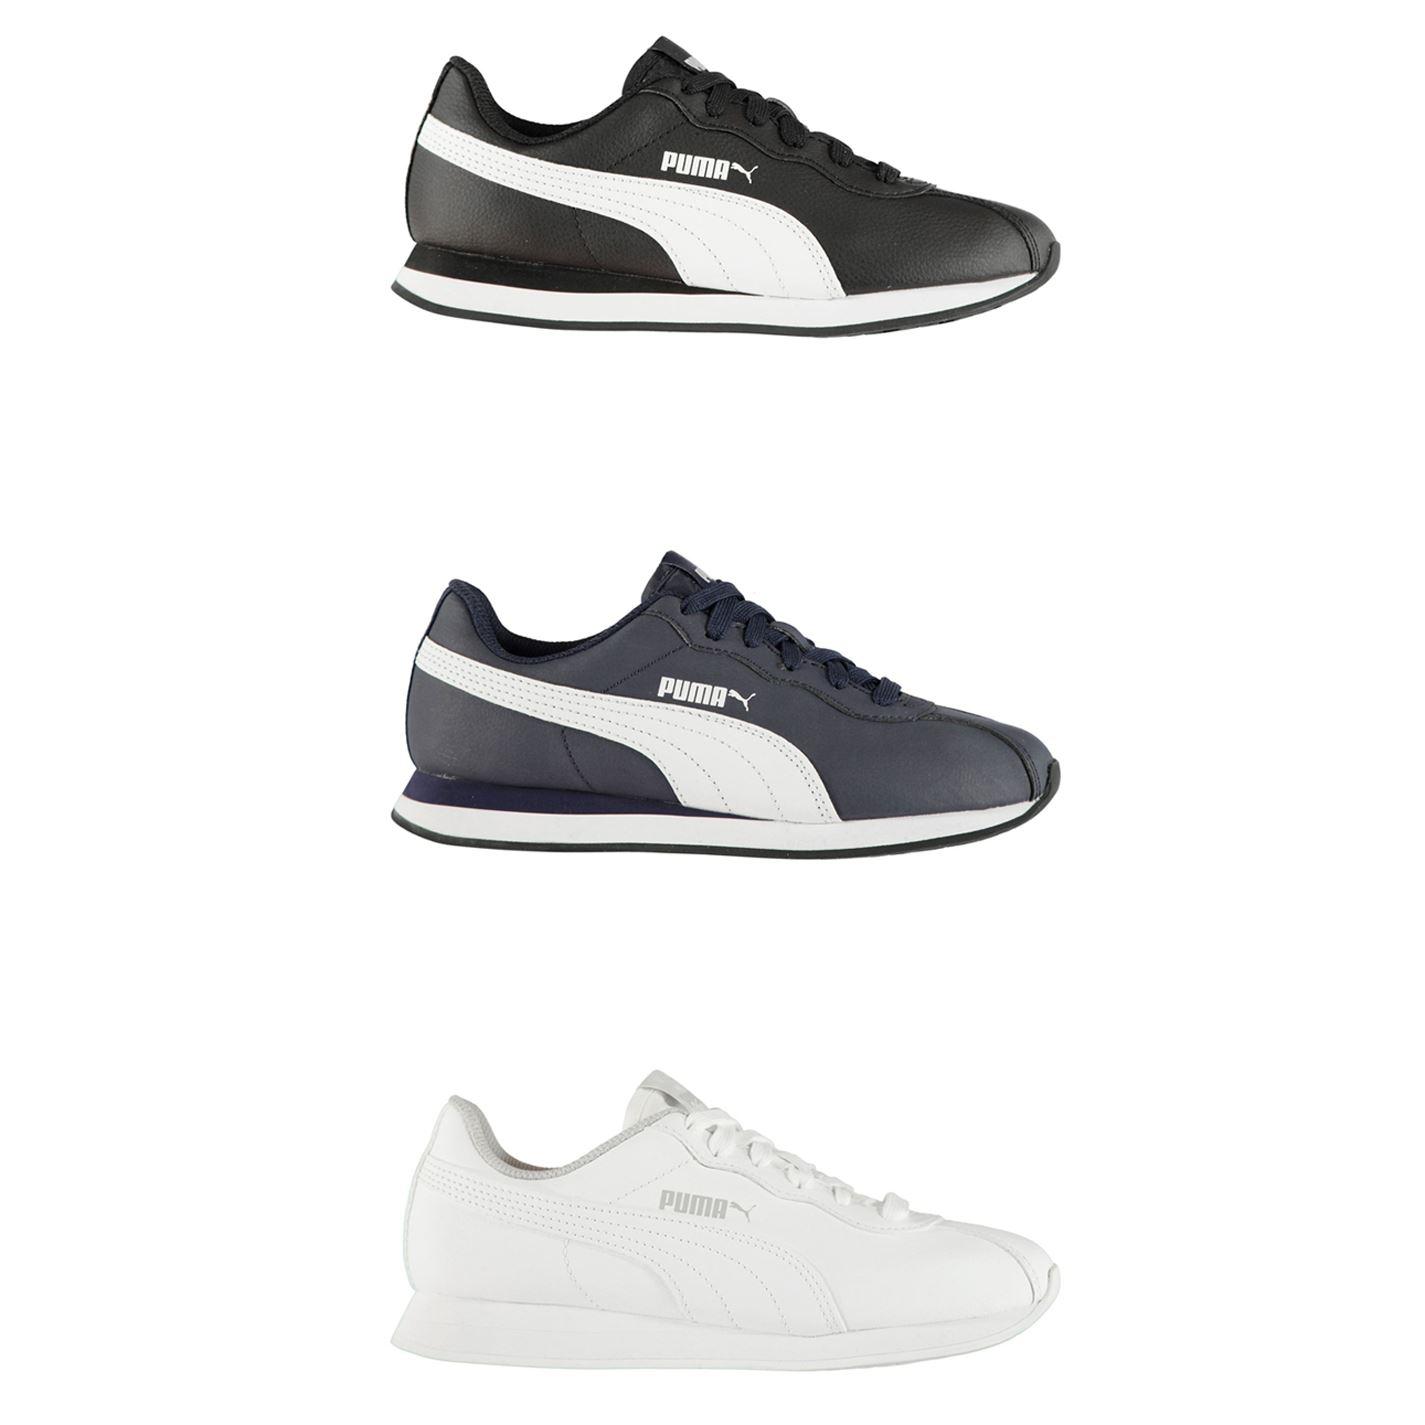 Kangol Boys Latham Junior Trainers Shoes Sneakers Kids